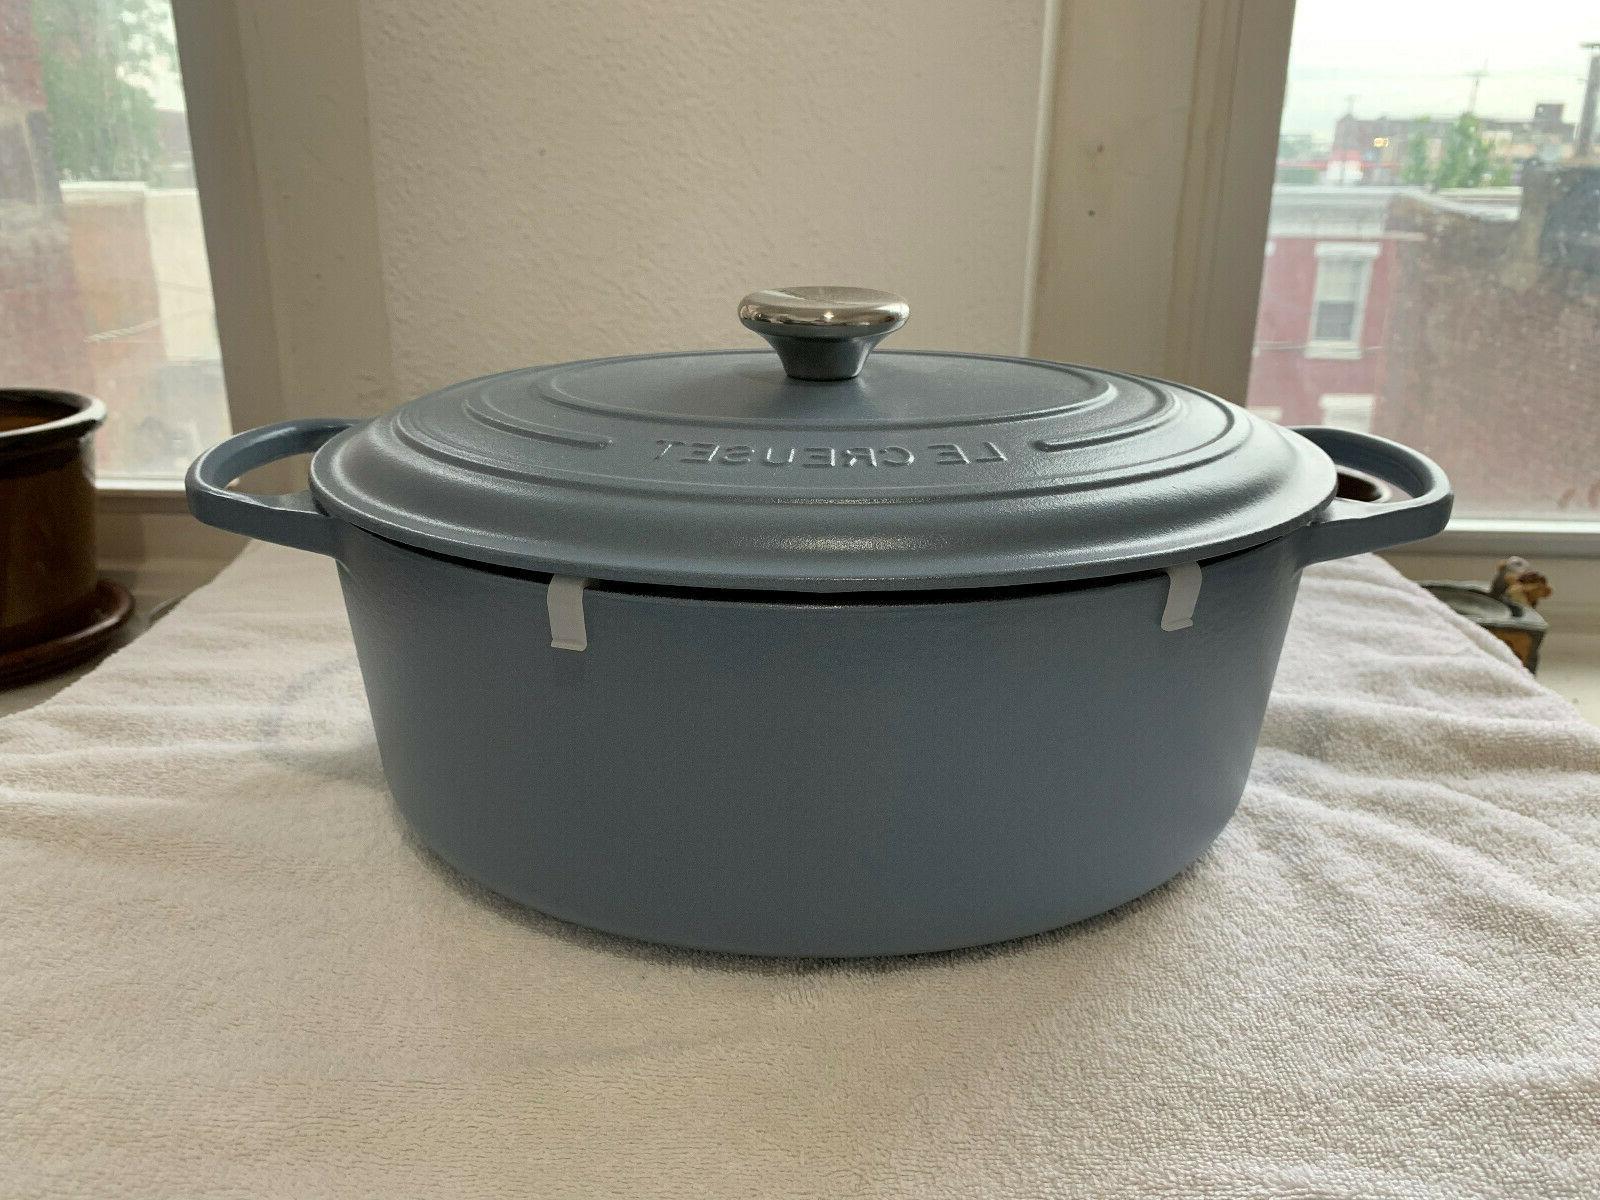 new 6 75 quart oval signature casserole